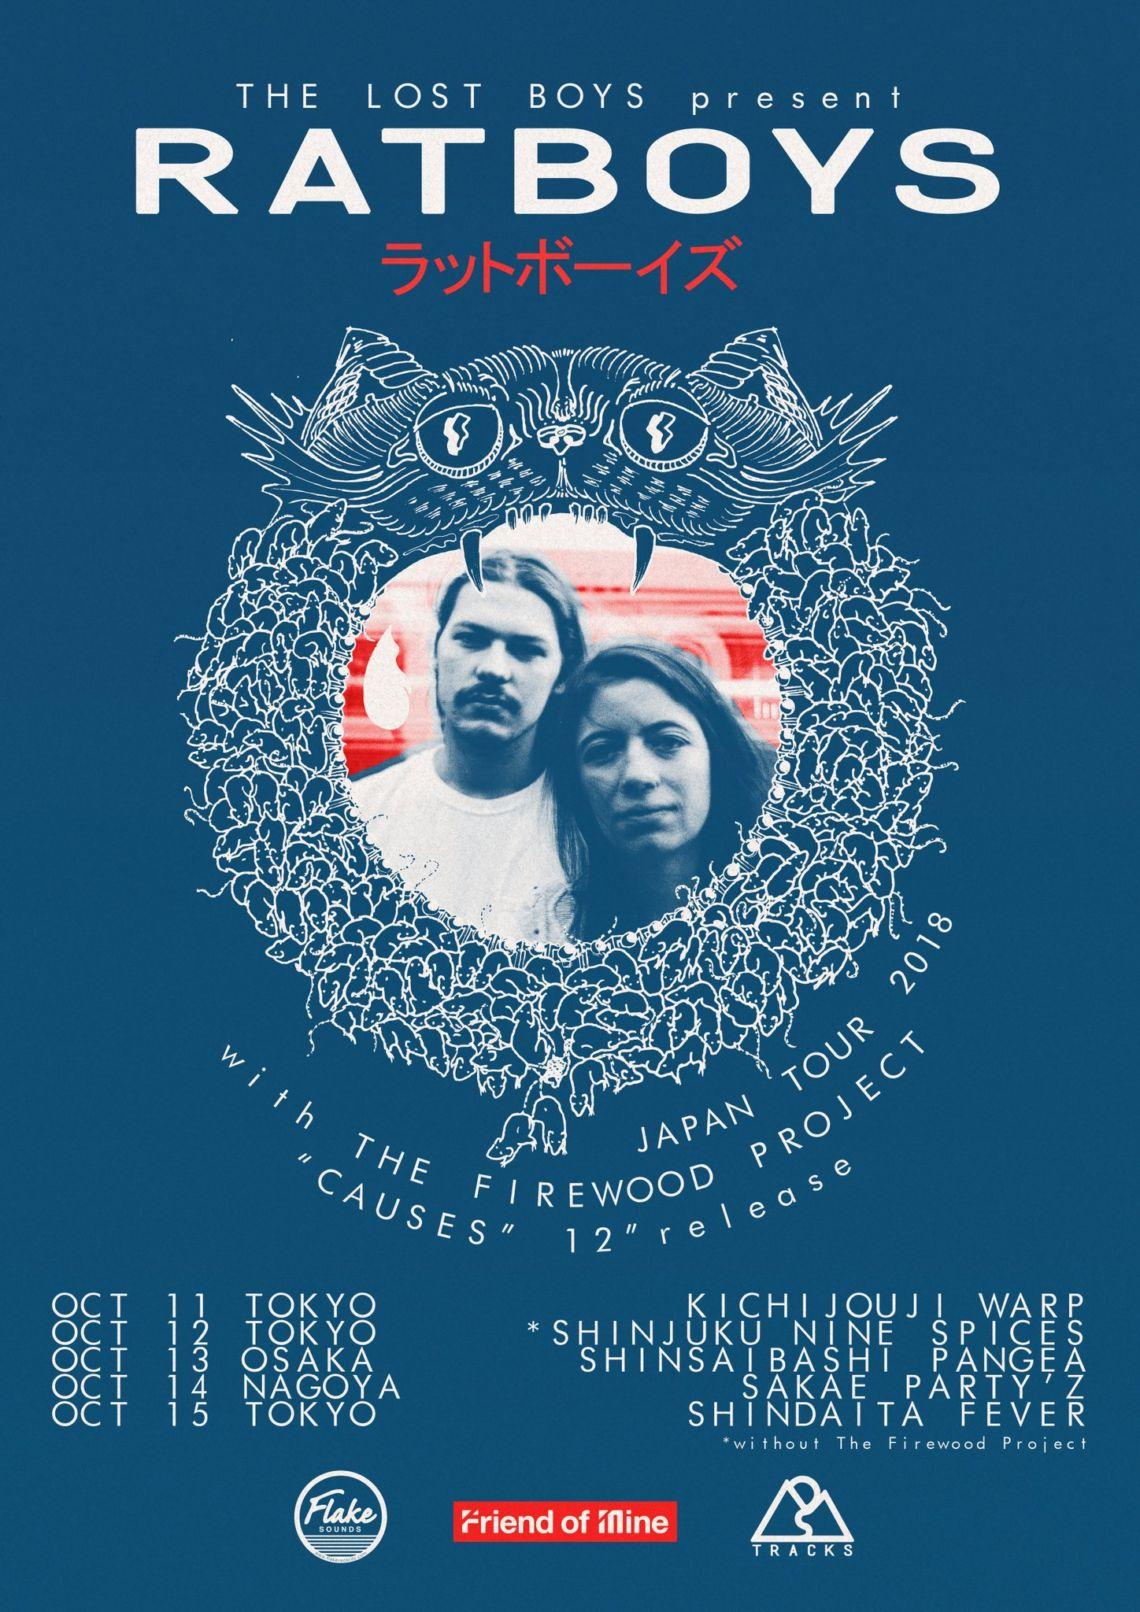 The Lost Boys presents「Ratboys Japan Tour 2018」